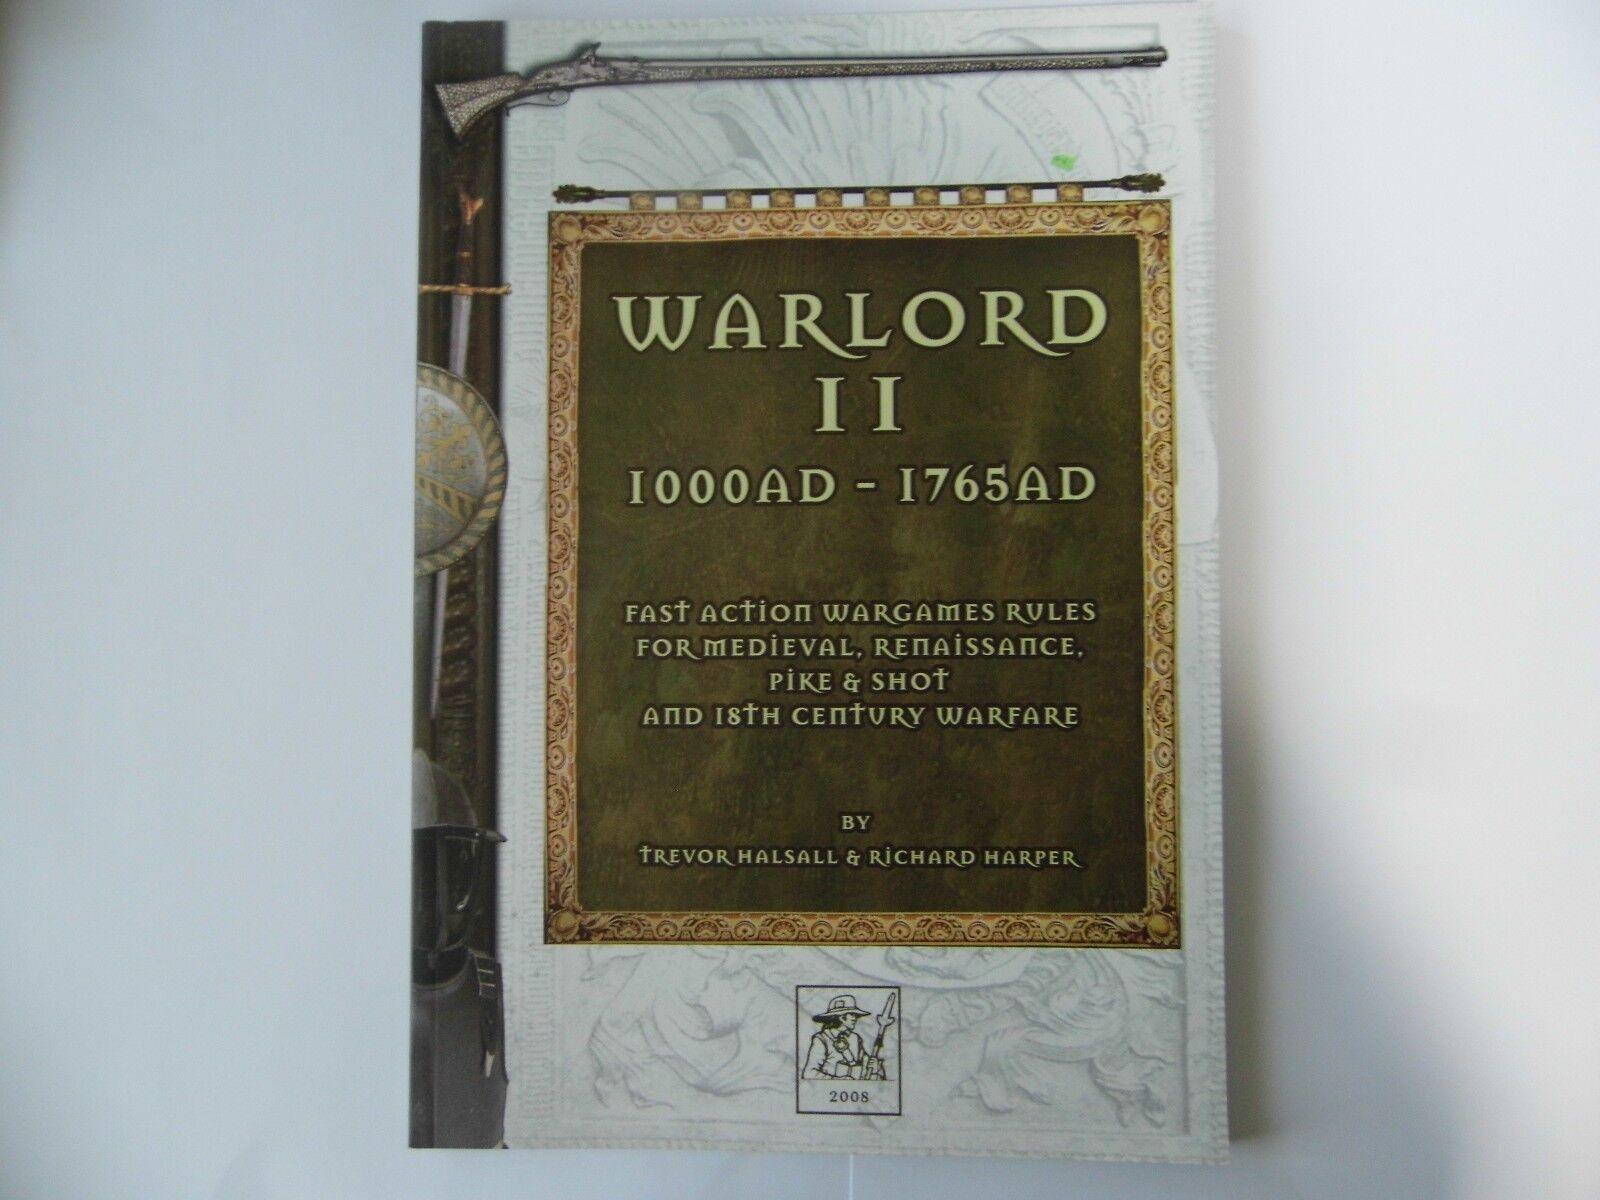 WARLORD II - 1000AD - 1765 AD - WARGAMES RULES - NEW